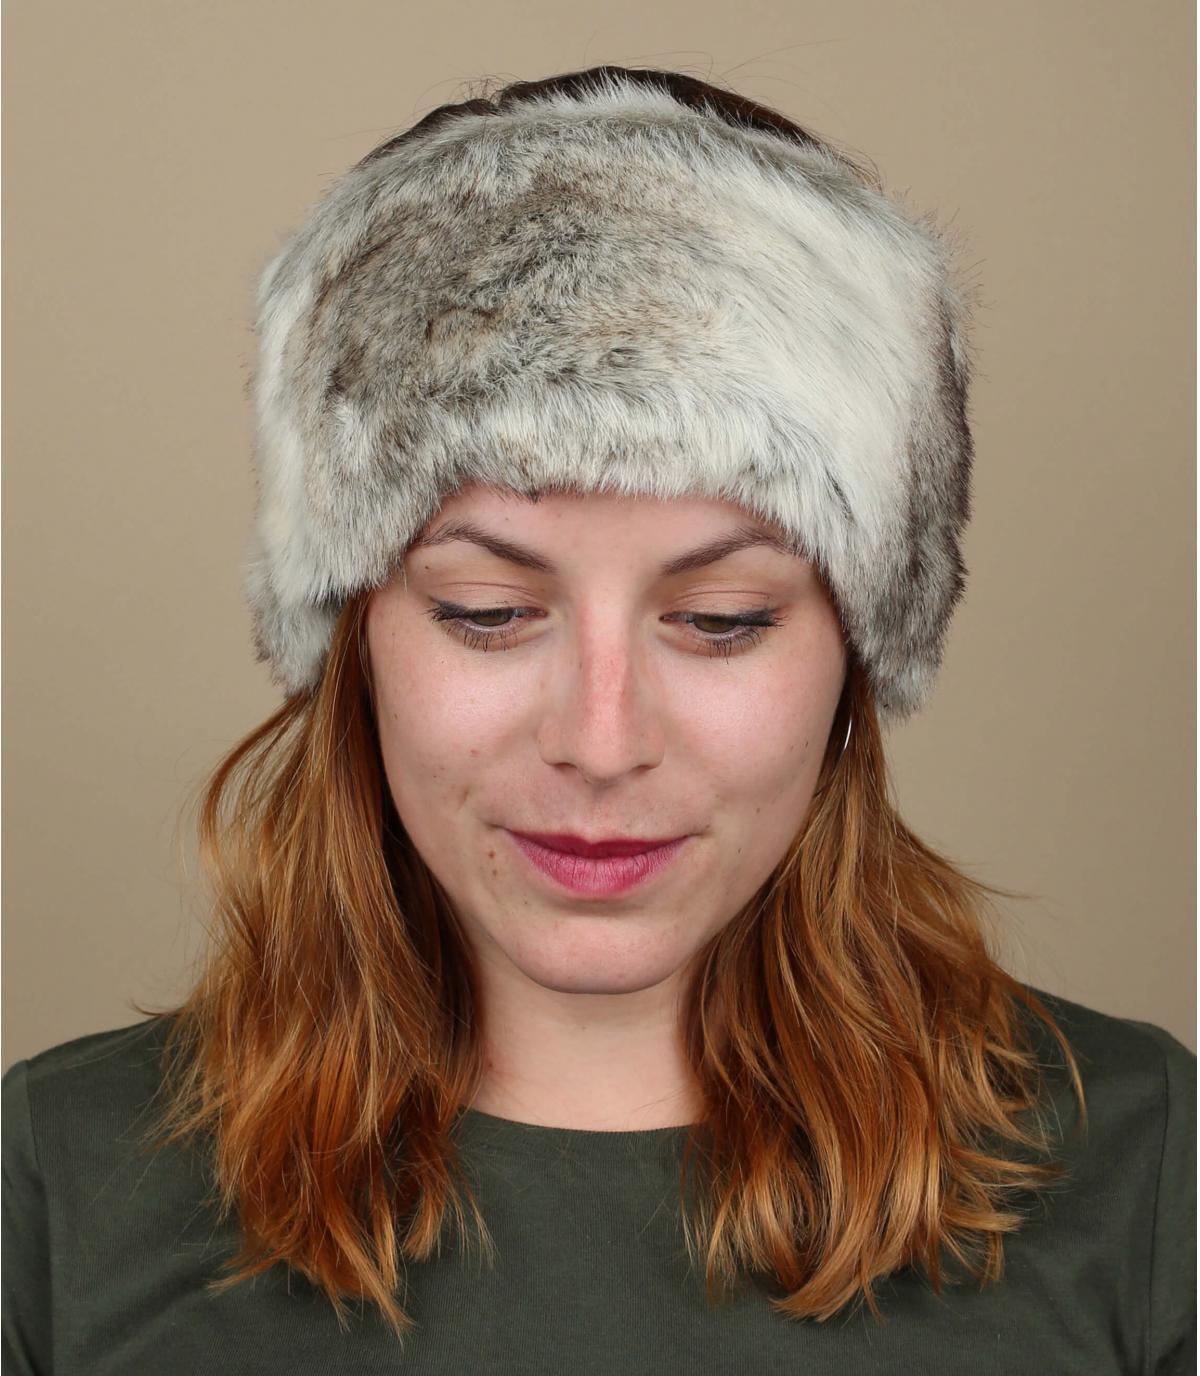 Gray fur headband